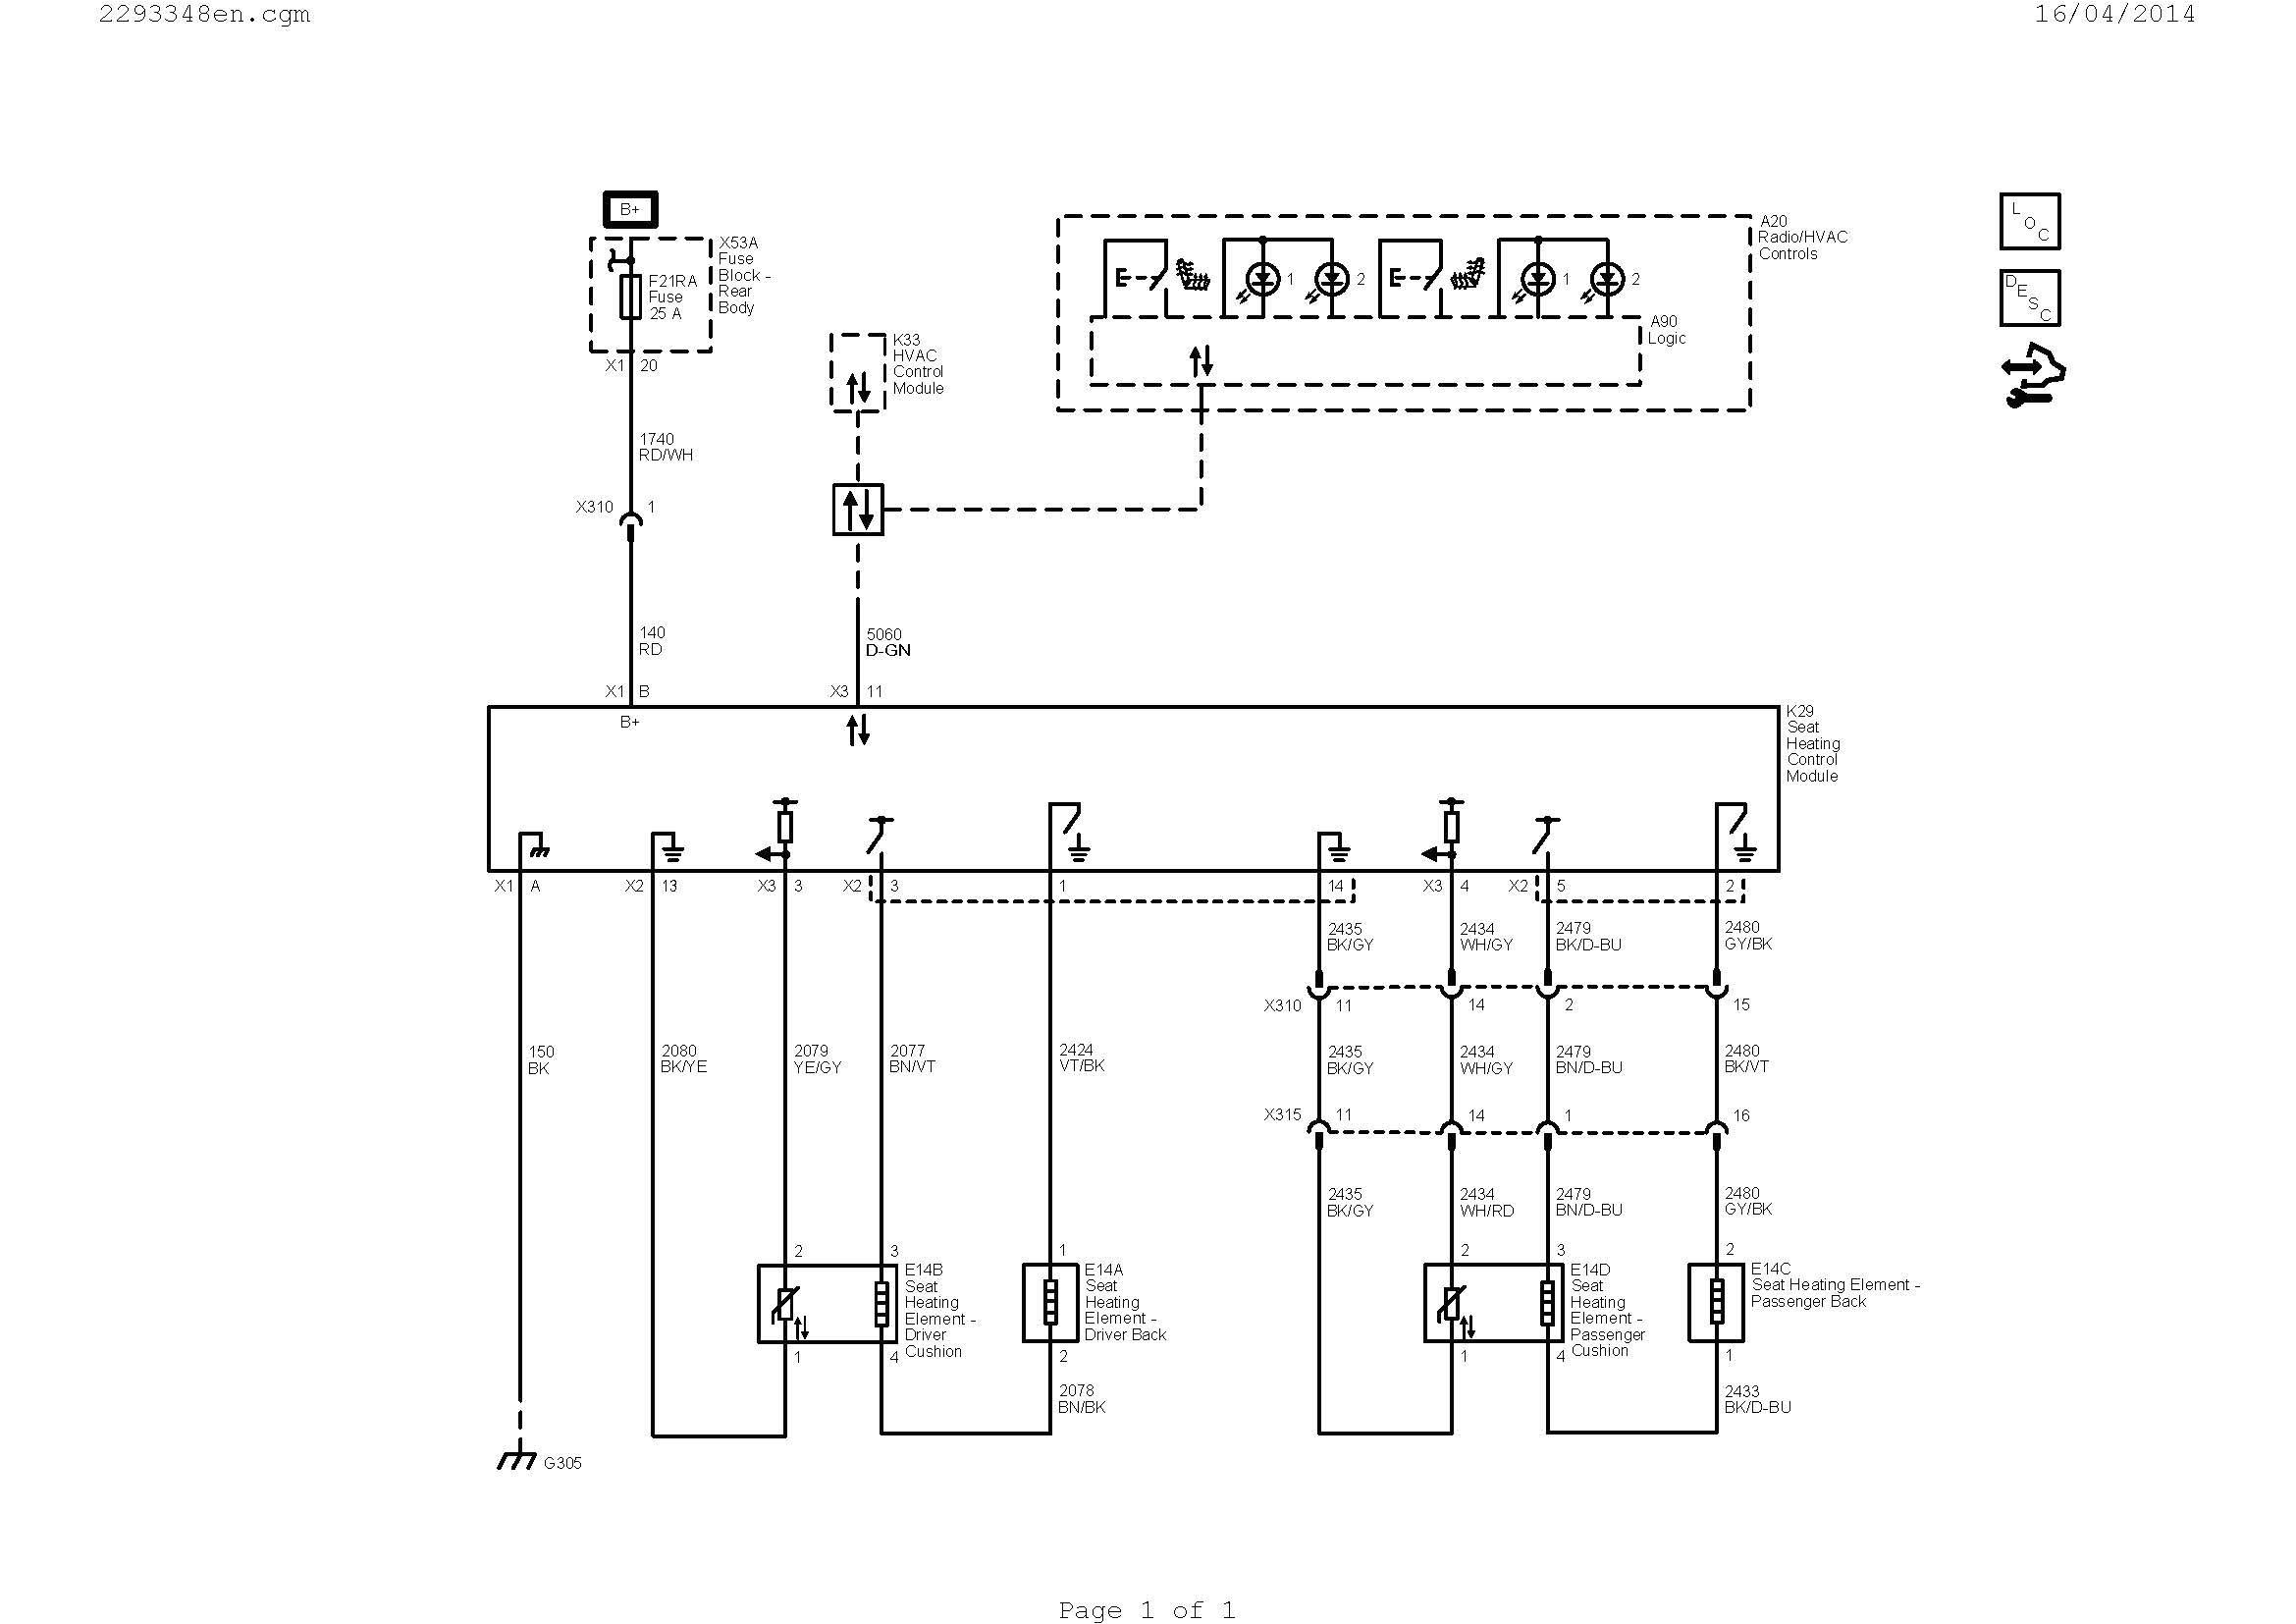 1746 Ox8 Wiring Diagram 1746 Ox8 Wiring Diagram Beautiful Allen Bradley Wiring Diagrams